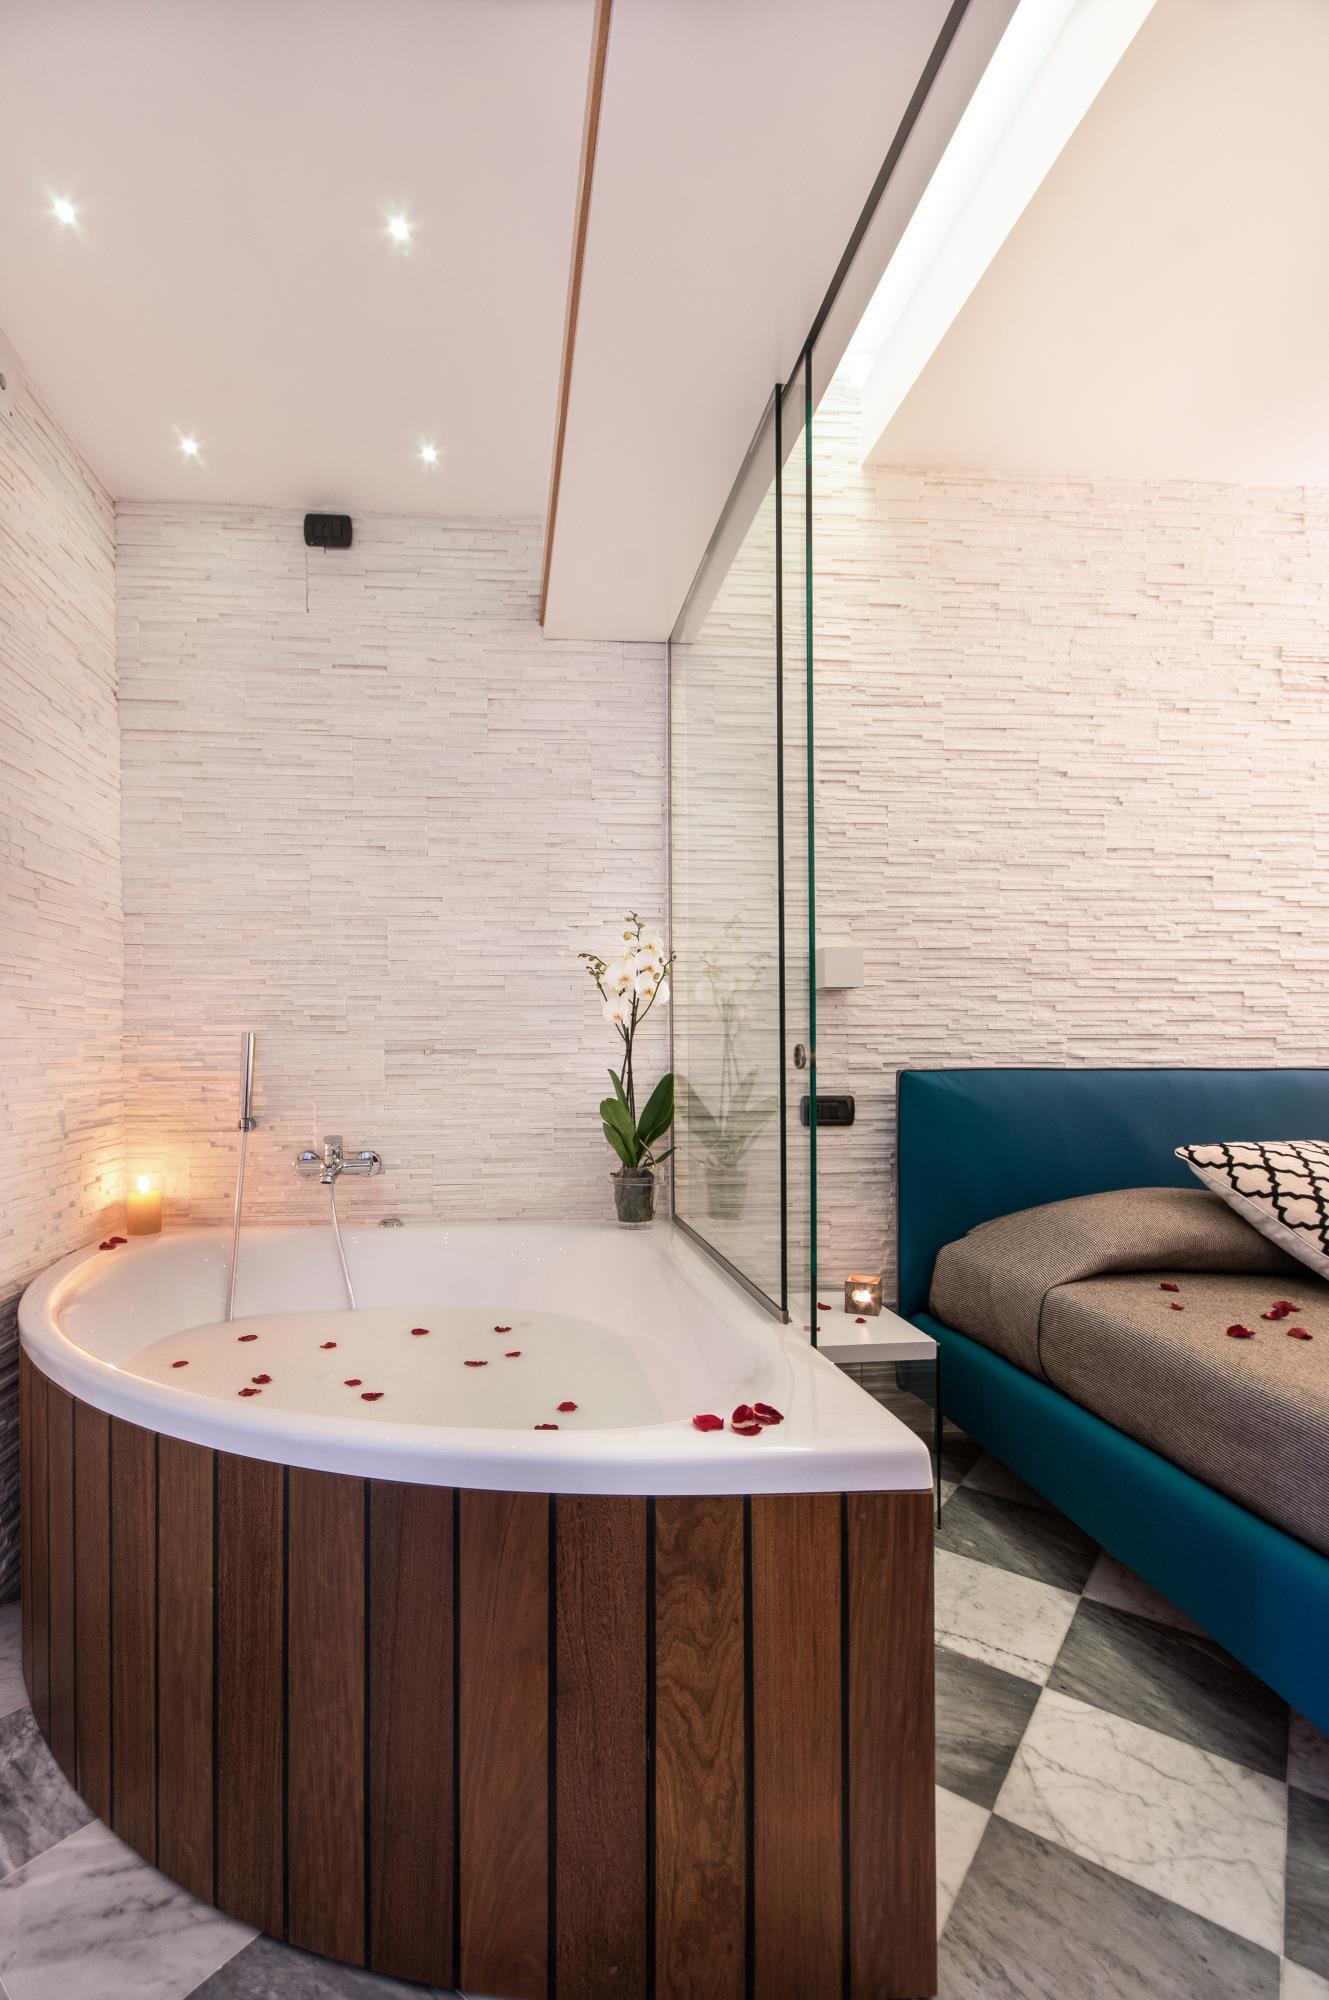 King Nova, camera lusso e di design - Luce Nova, Cagliari